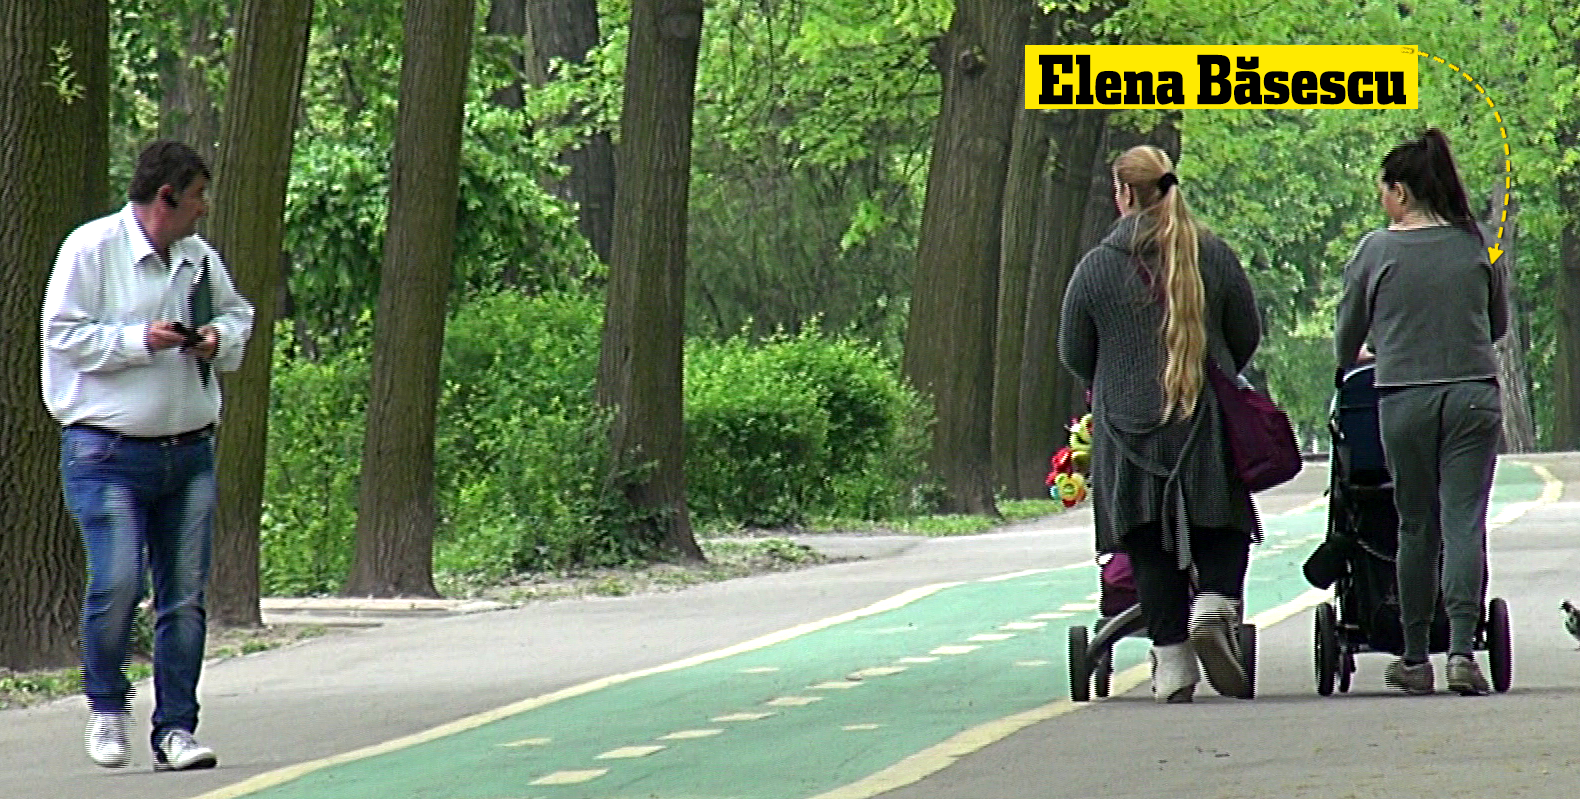 Elena Basescu a trecut pe langa barbatul care s-a intalnit cu tatal sau. Daca acesta s-a intors, EBA a trecut impasibila